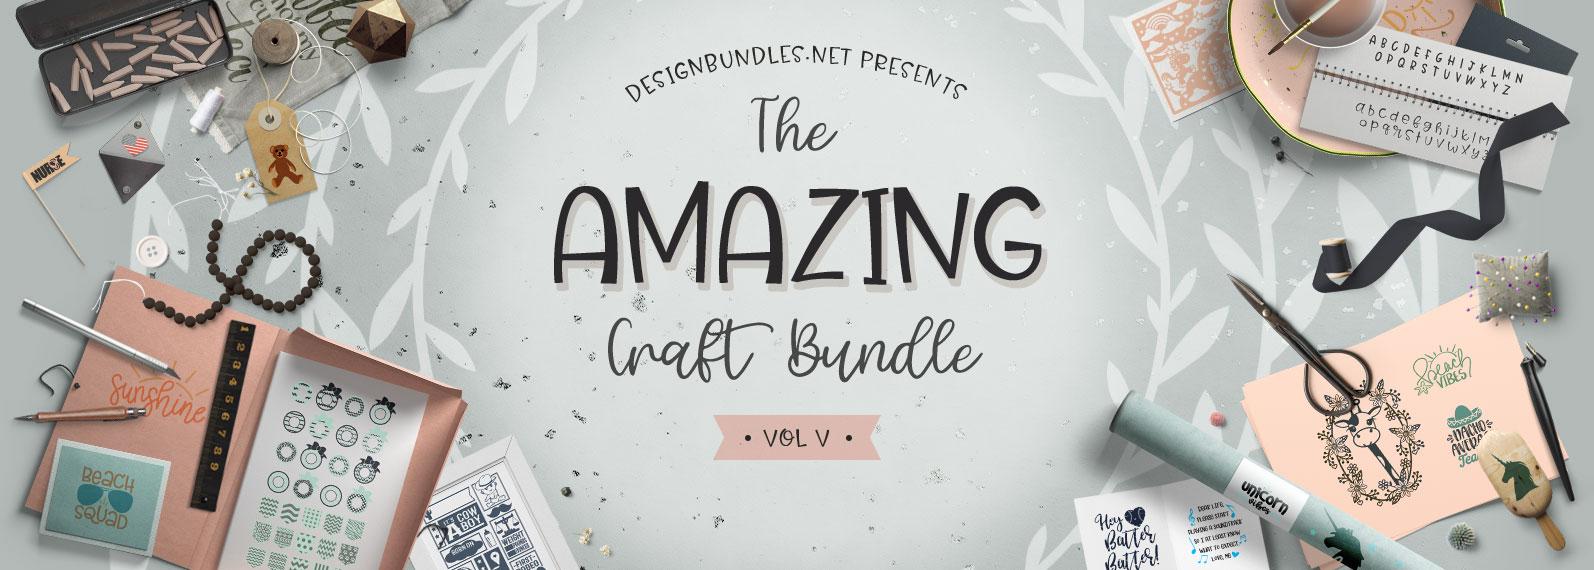 The Amazing Craft Bundle V Cover